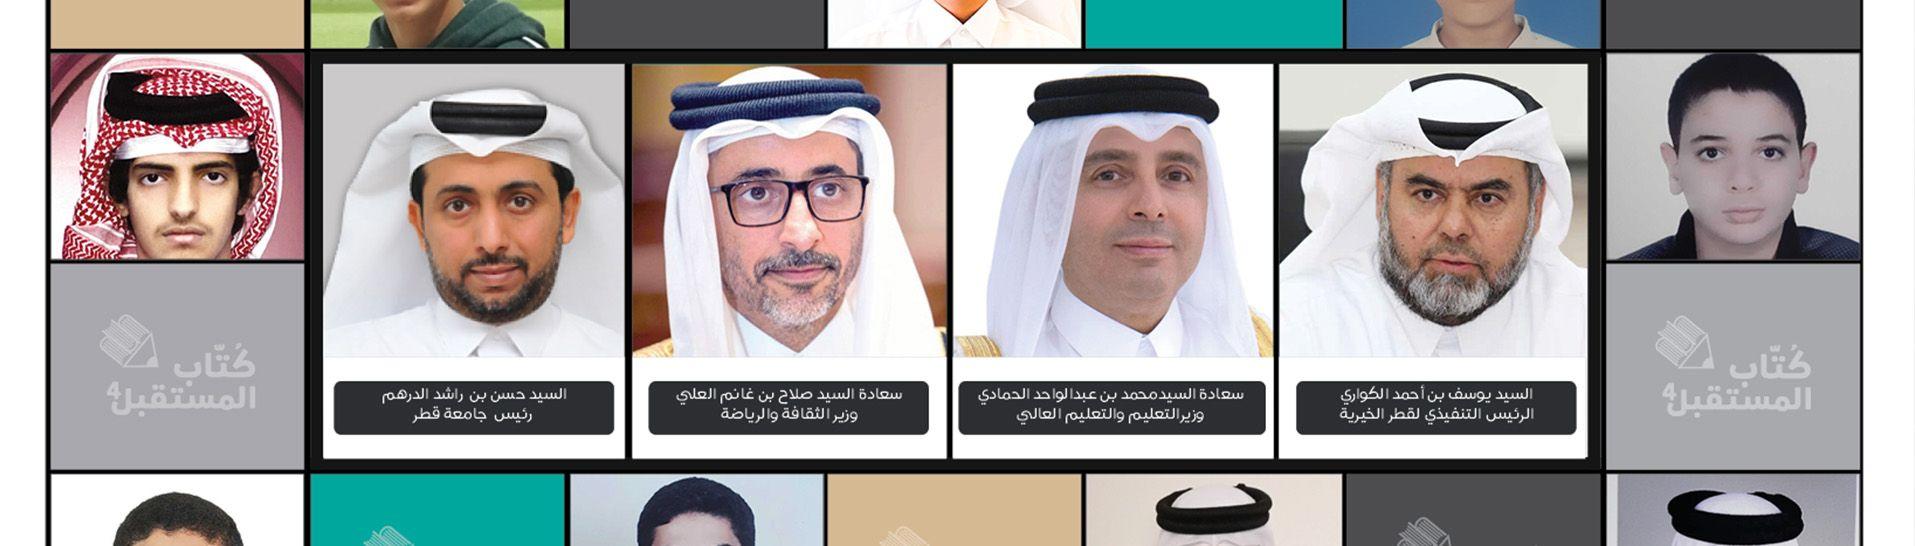 Qatar Charity announces winners in 'Future's Writers4